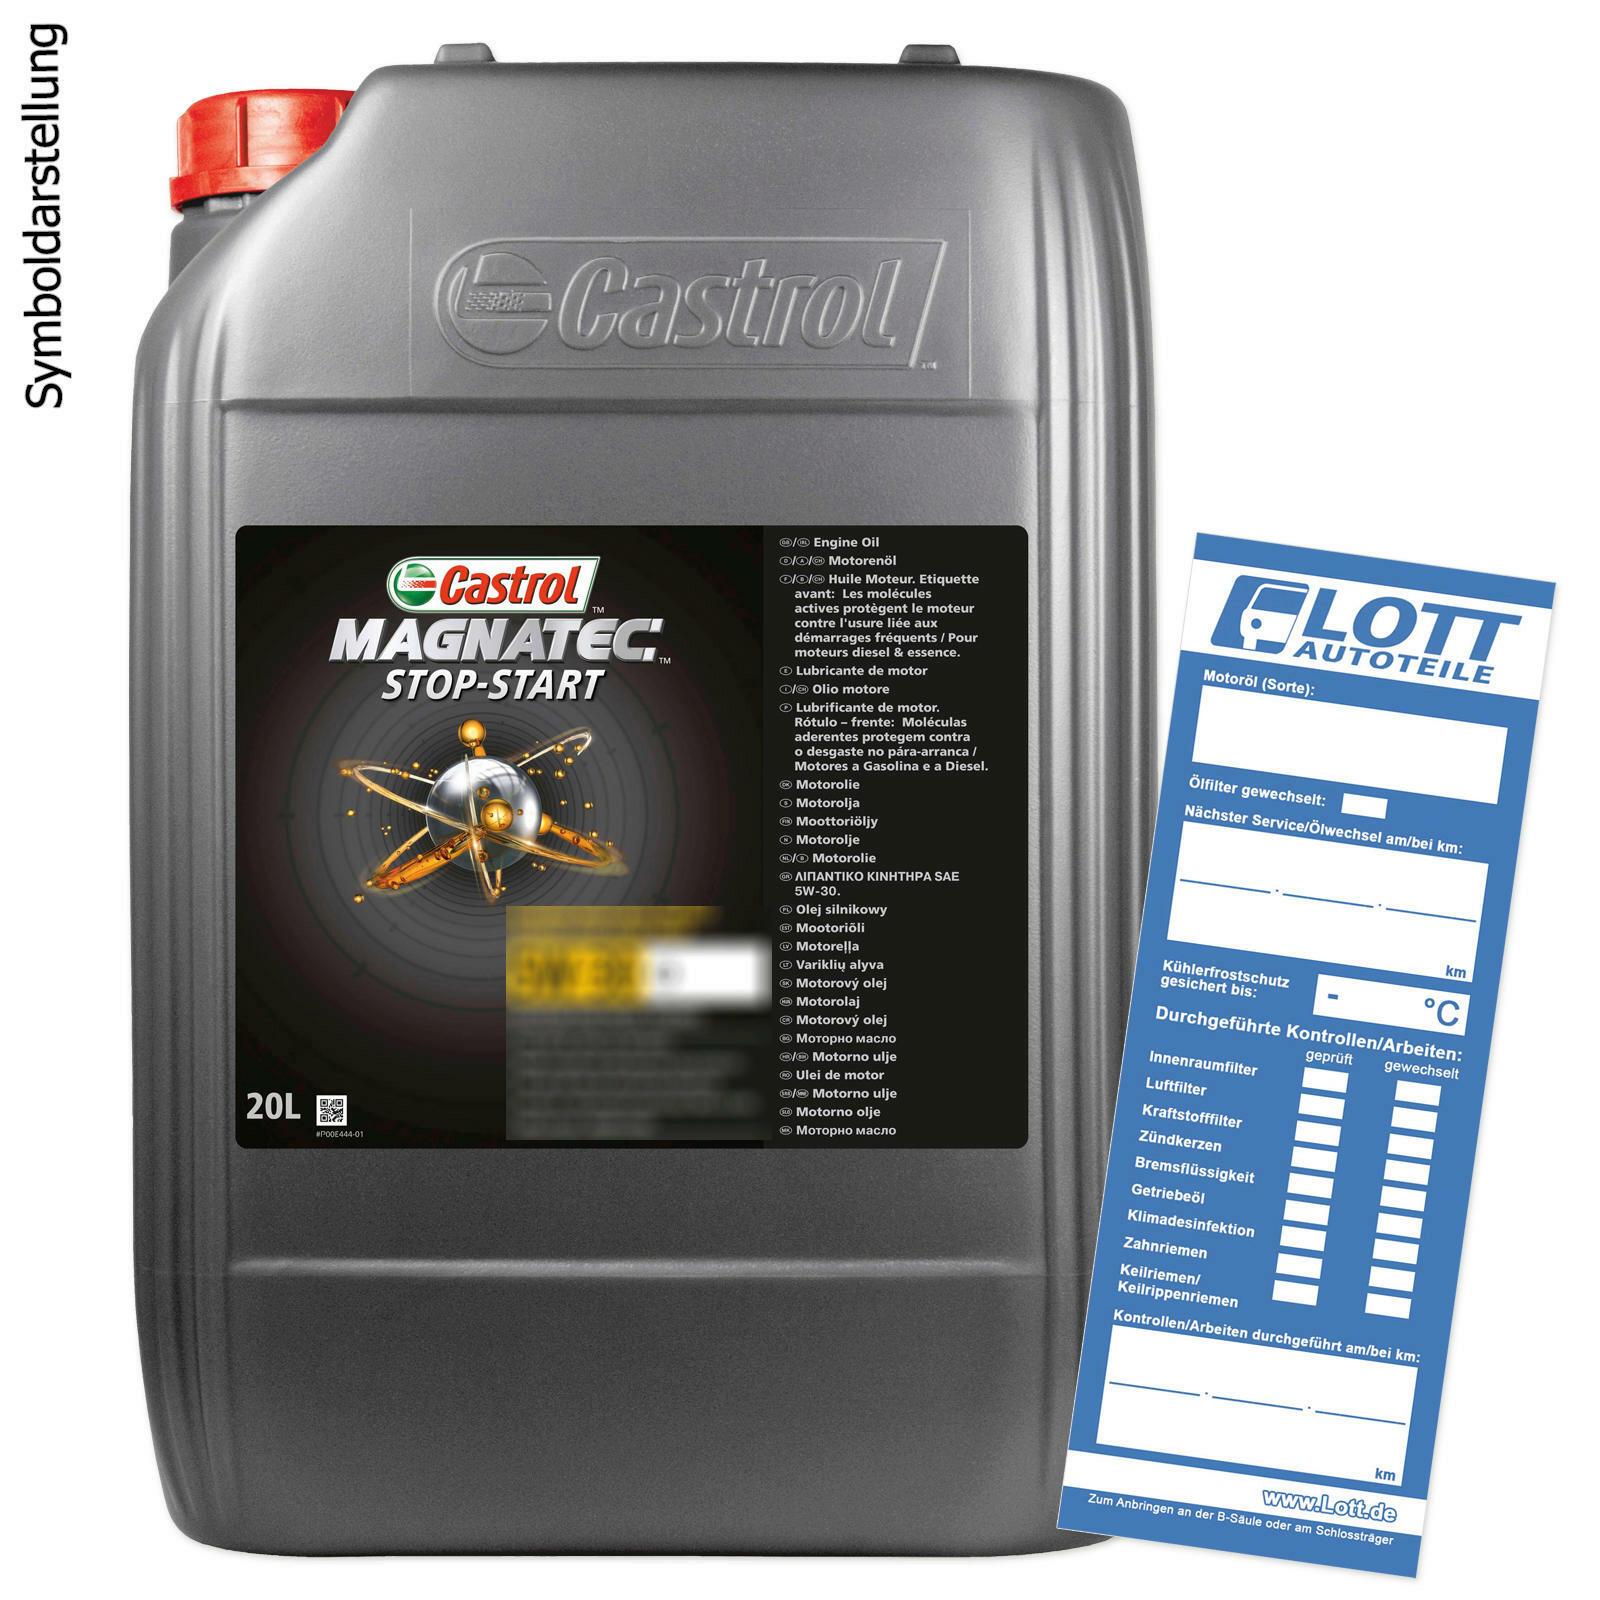 CASTROL Motoröl MAGNATEC STOP-START 0W-30